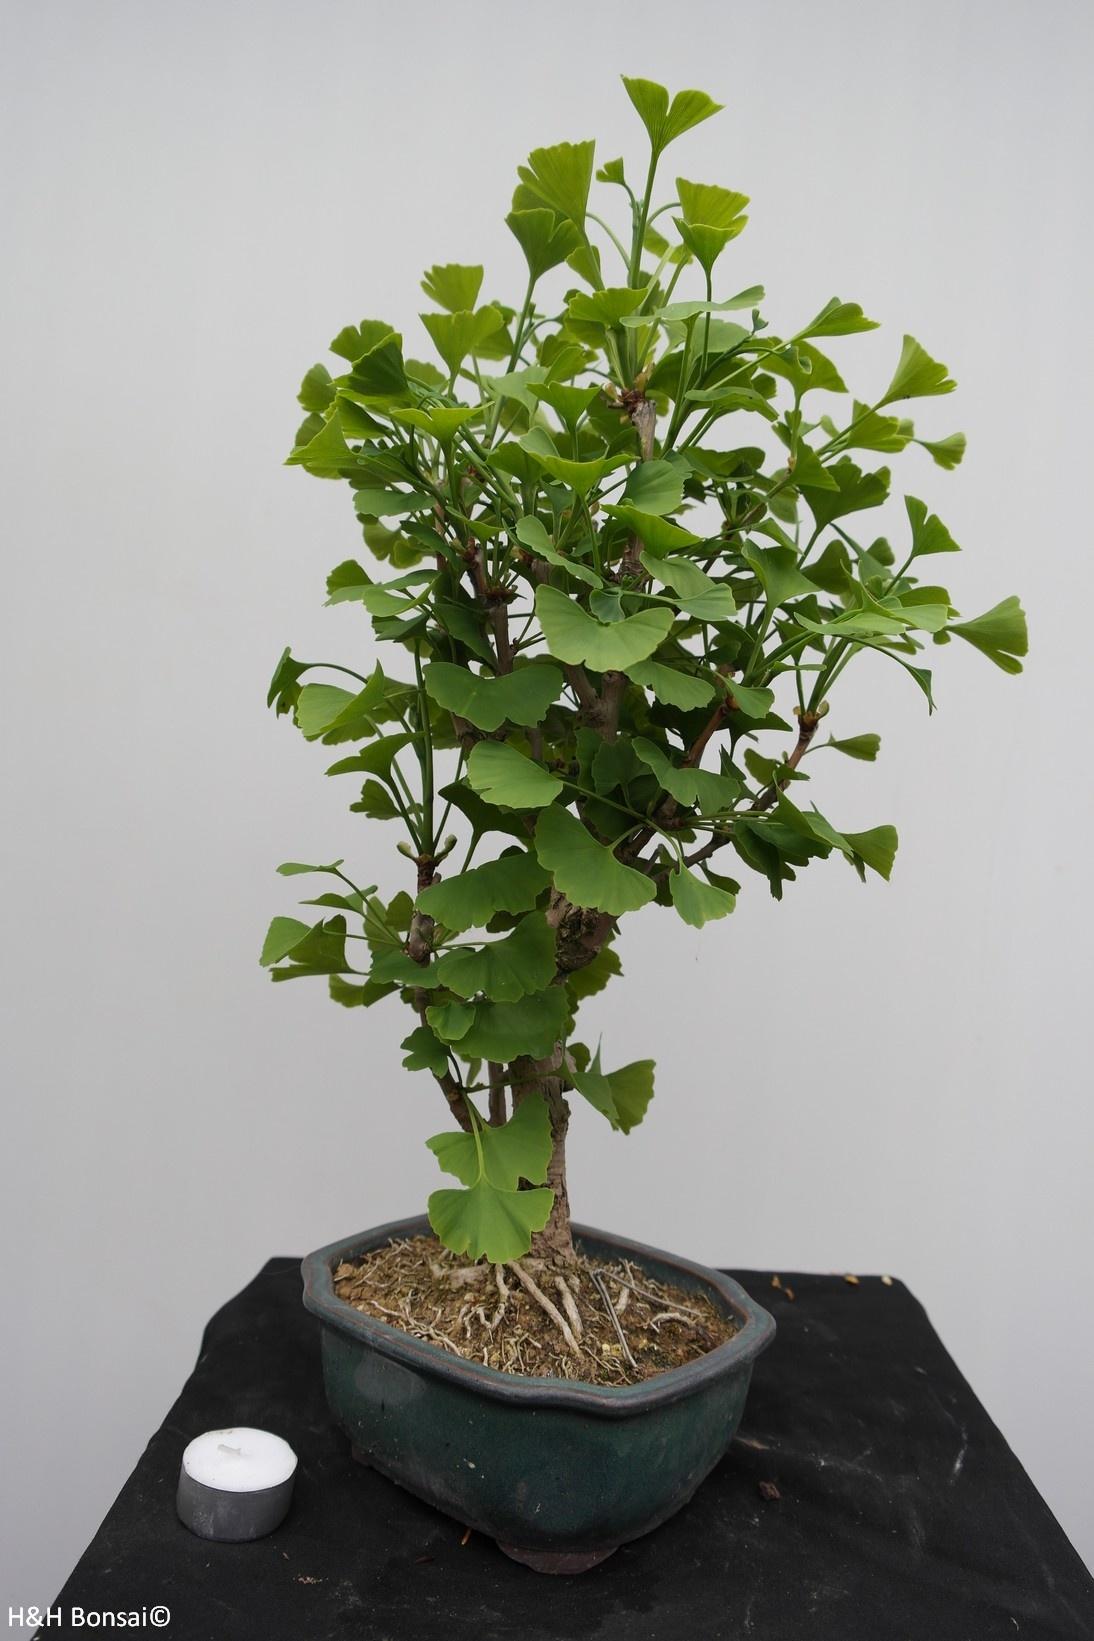 Bonsai Ginkgo biloba, Japanse notenboom, nr. 7795